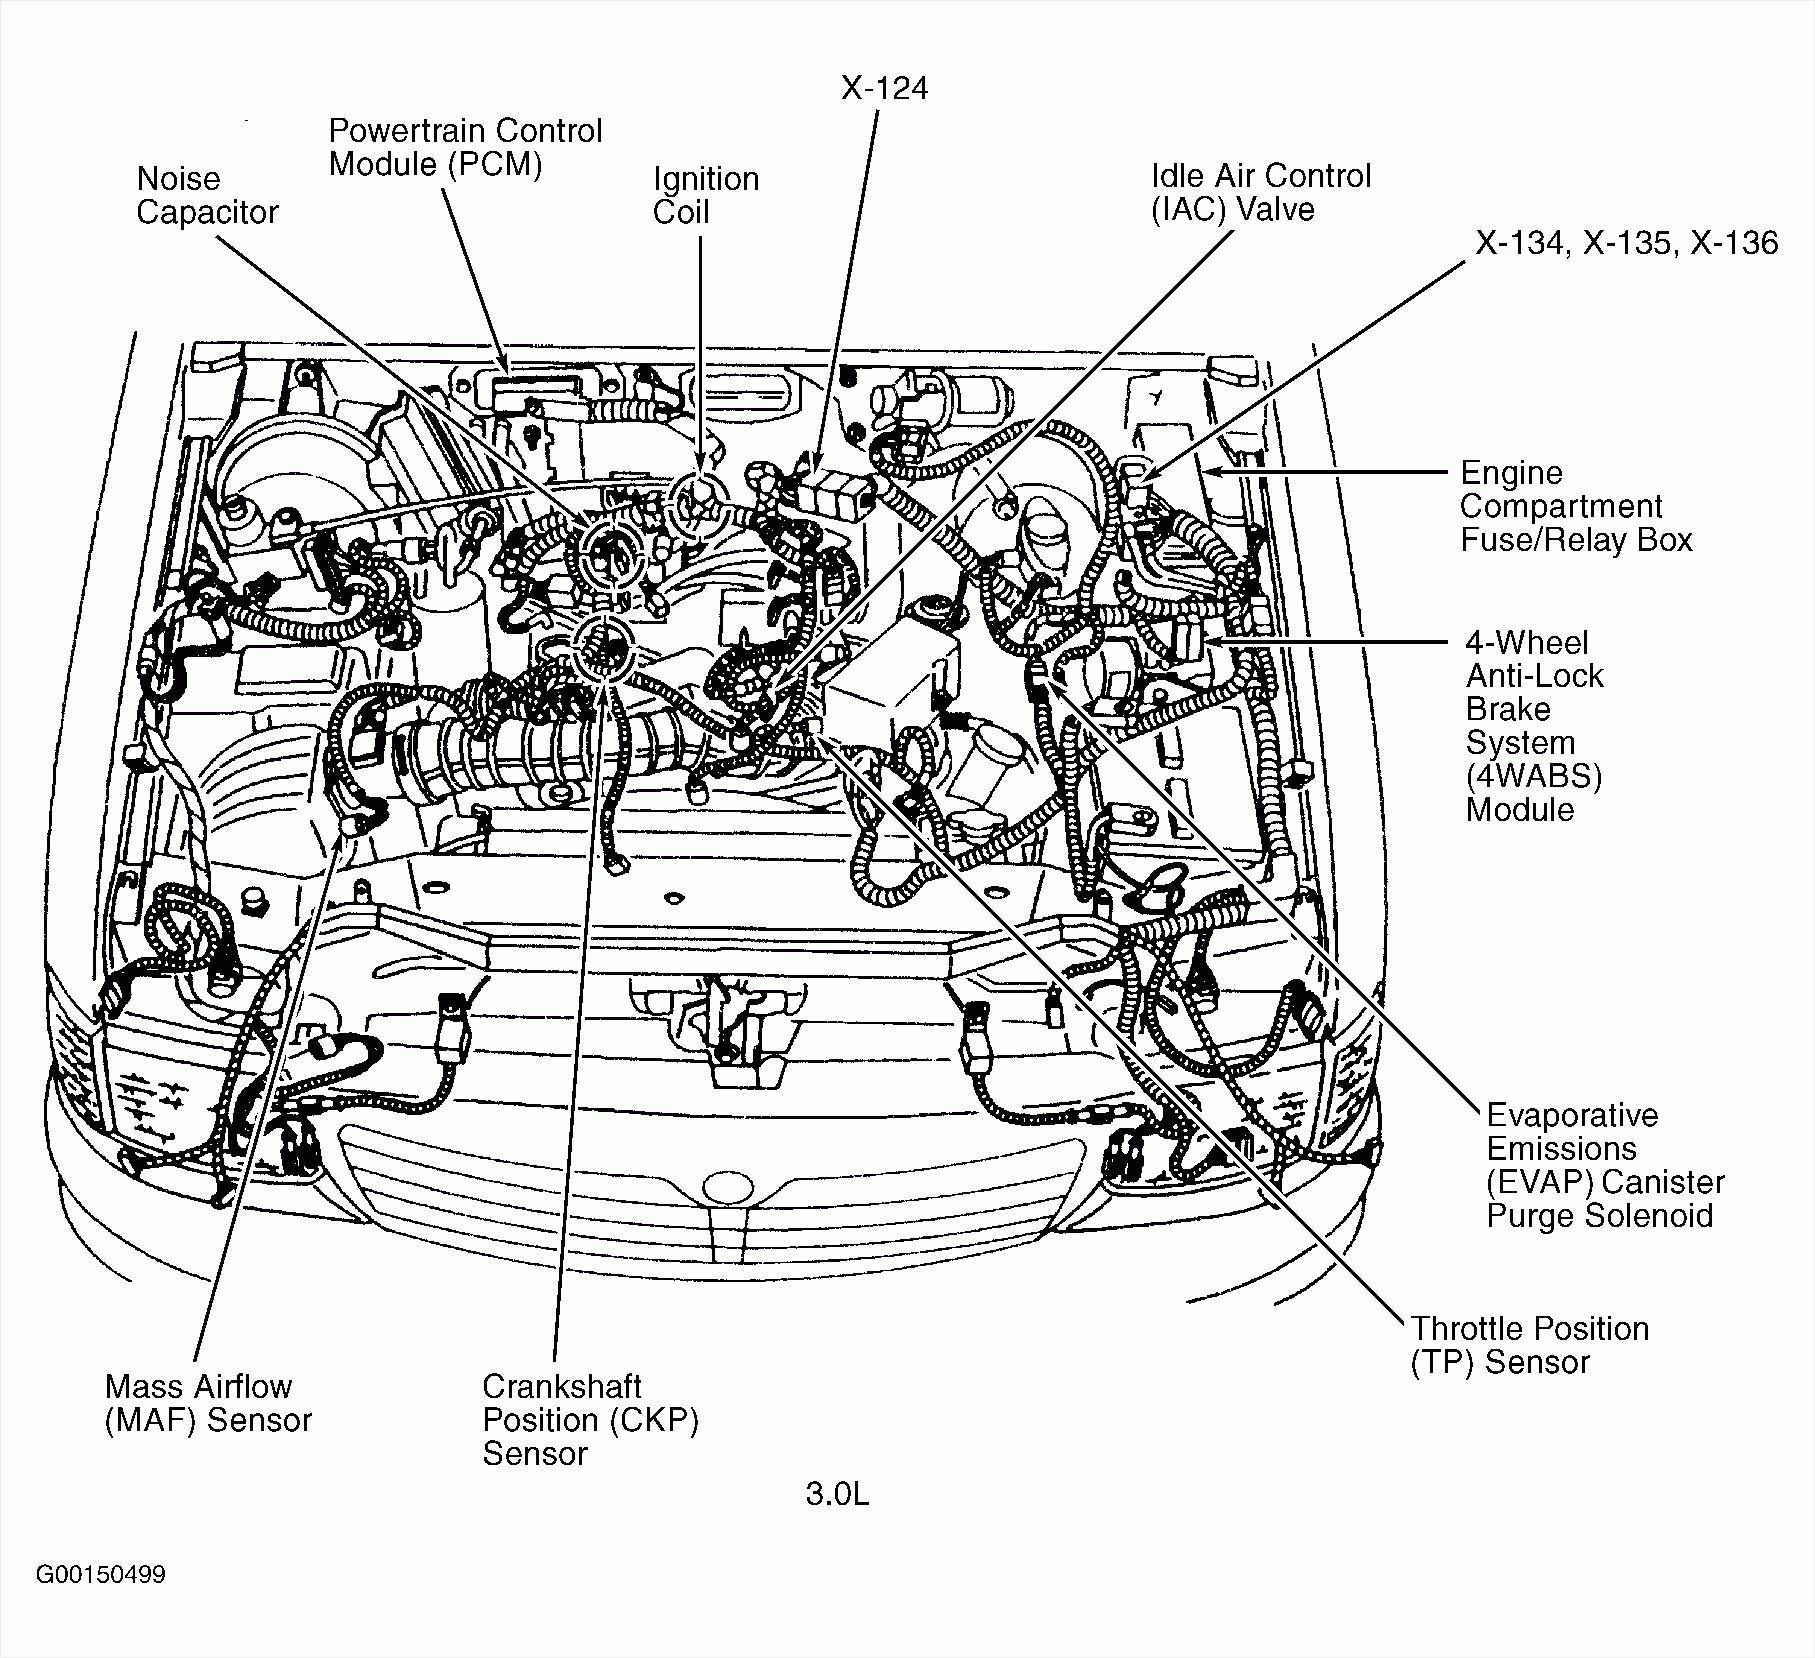 2008 dodge nitro engine diagram wiring spotlights fuse box best library chrysler 3 8 v6 diagrams rh 55 treatchildtrauma de